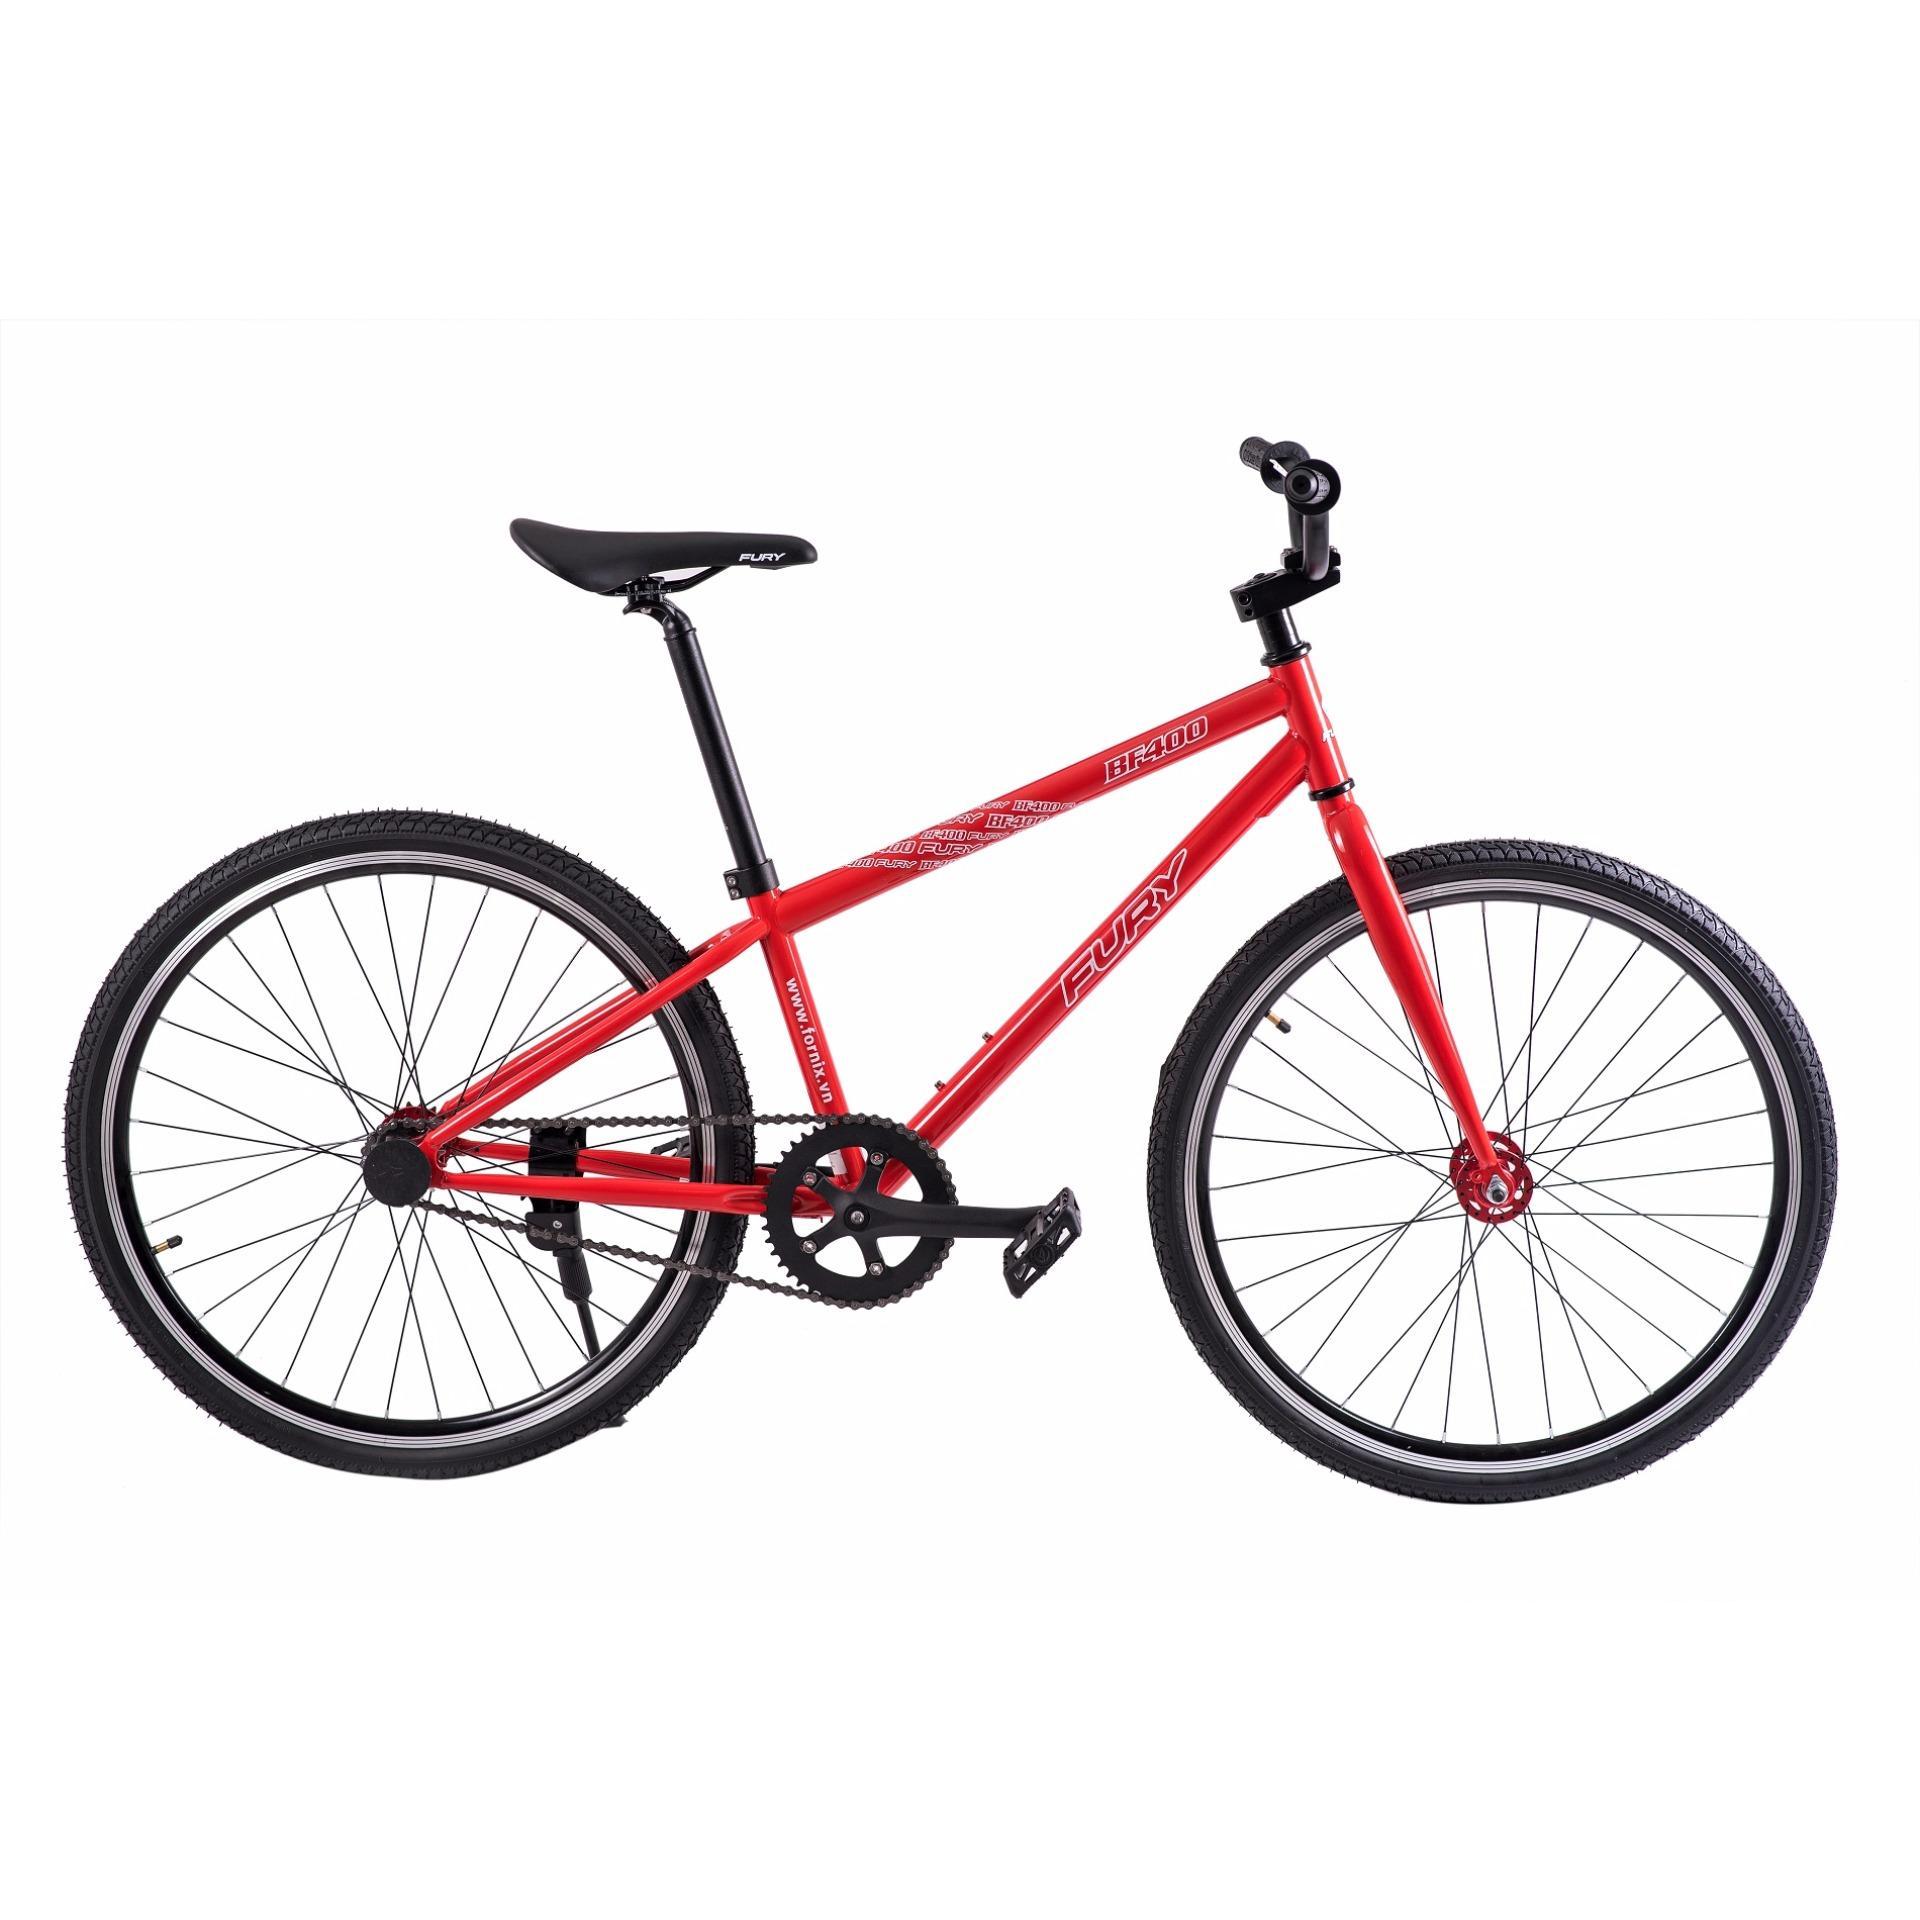 Xe đạp FixedGear, hiệu FURY, mã BF400 ( đỏ )